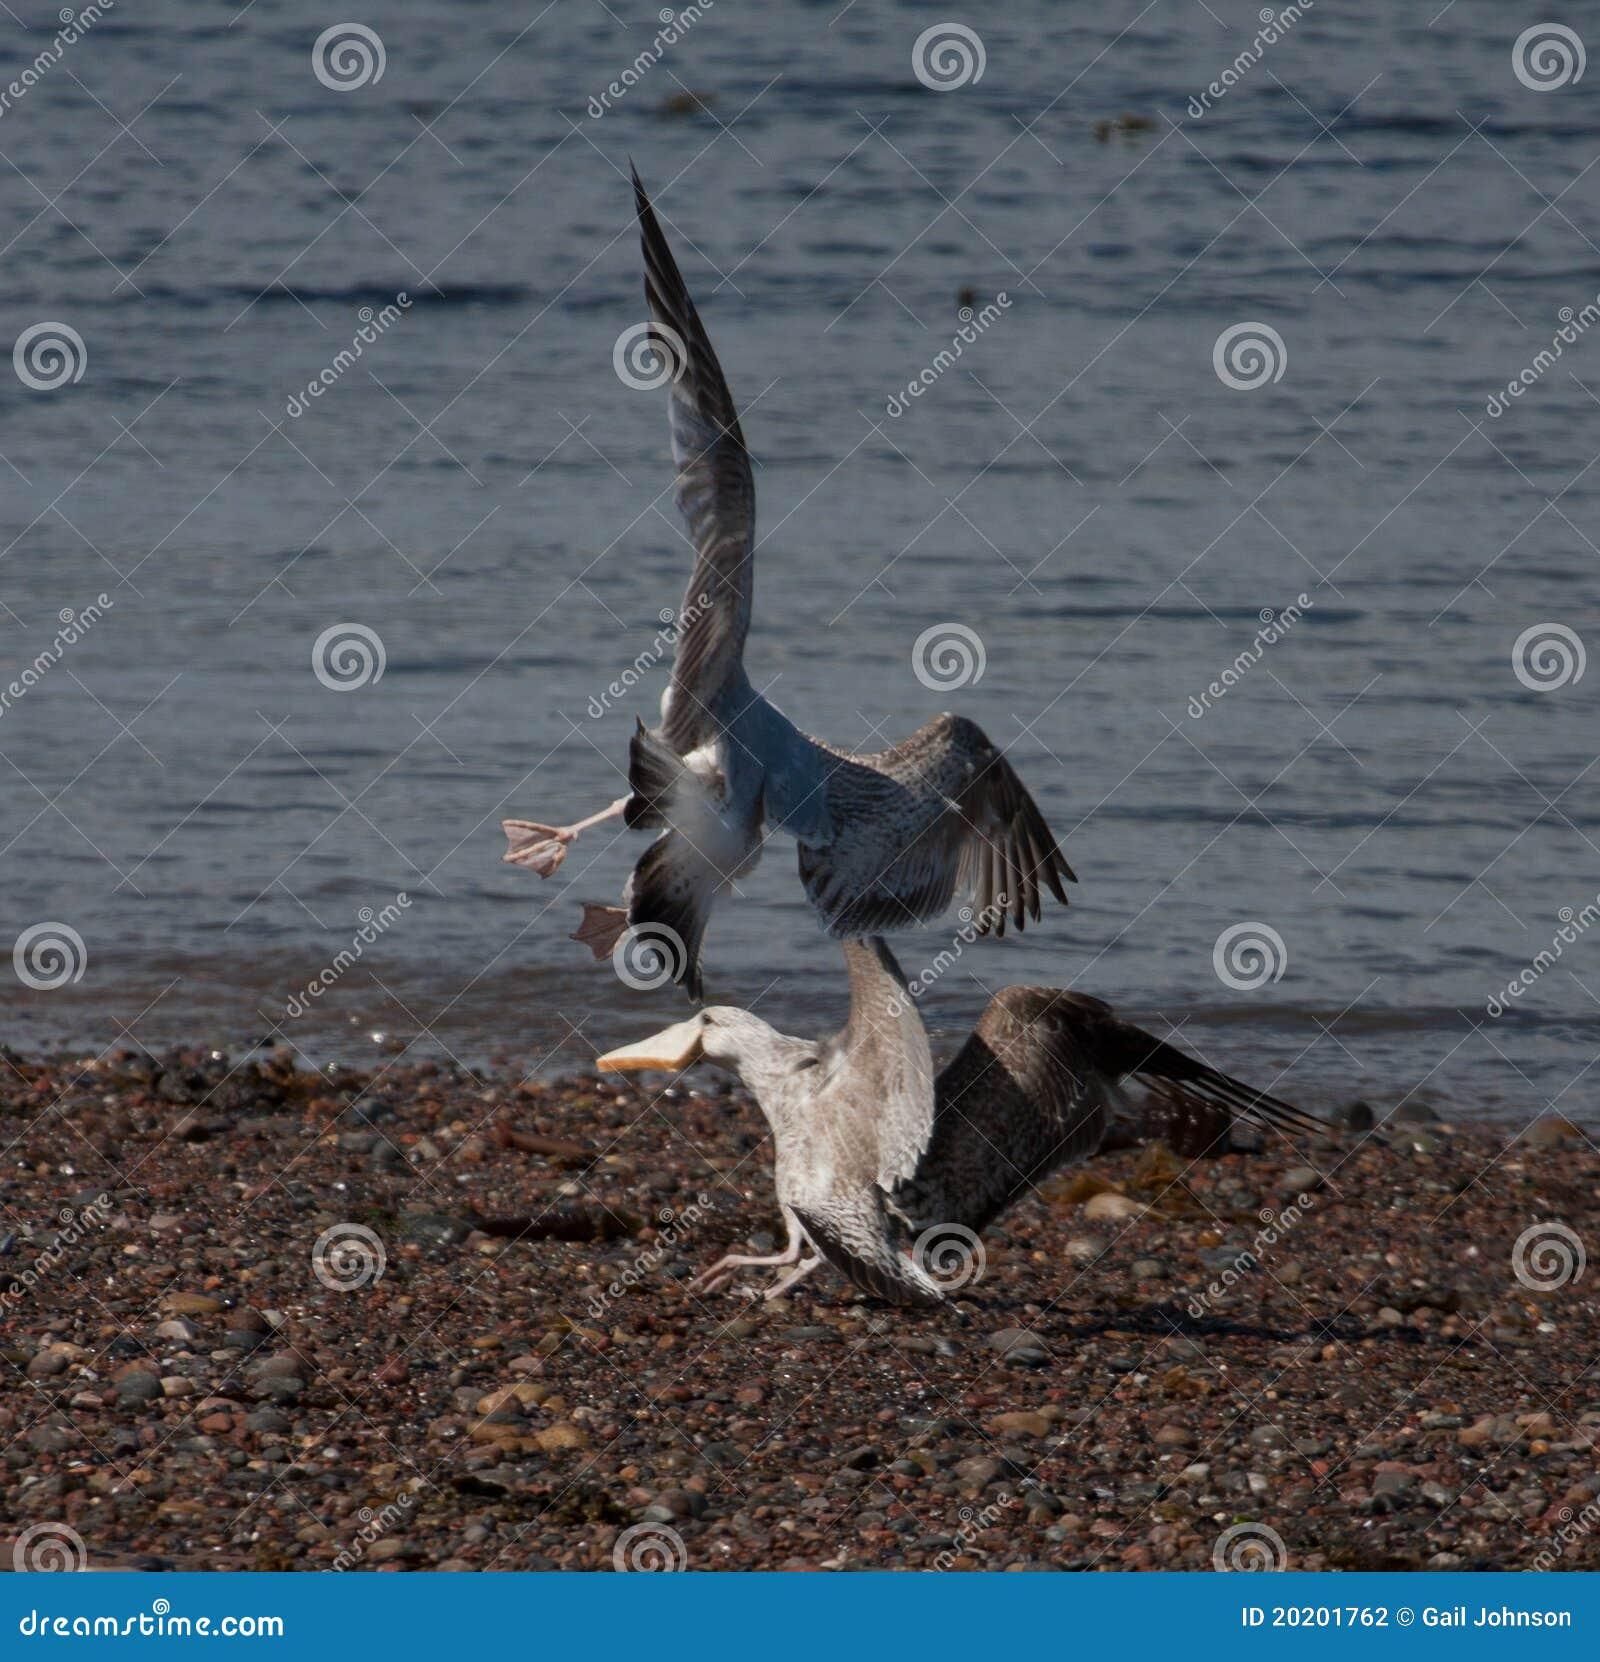 Stock Photography Birds Flying Image20201762